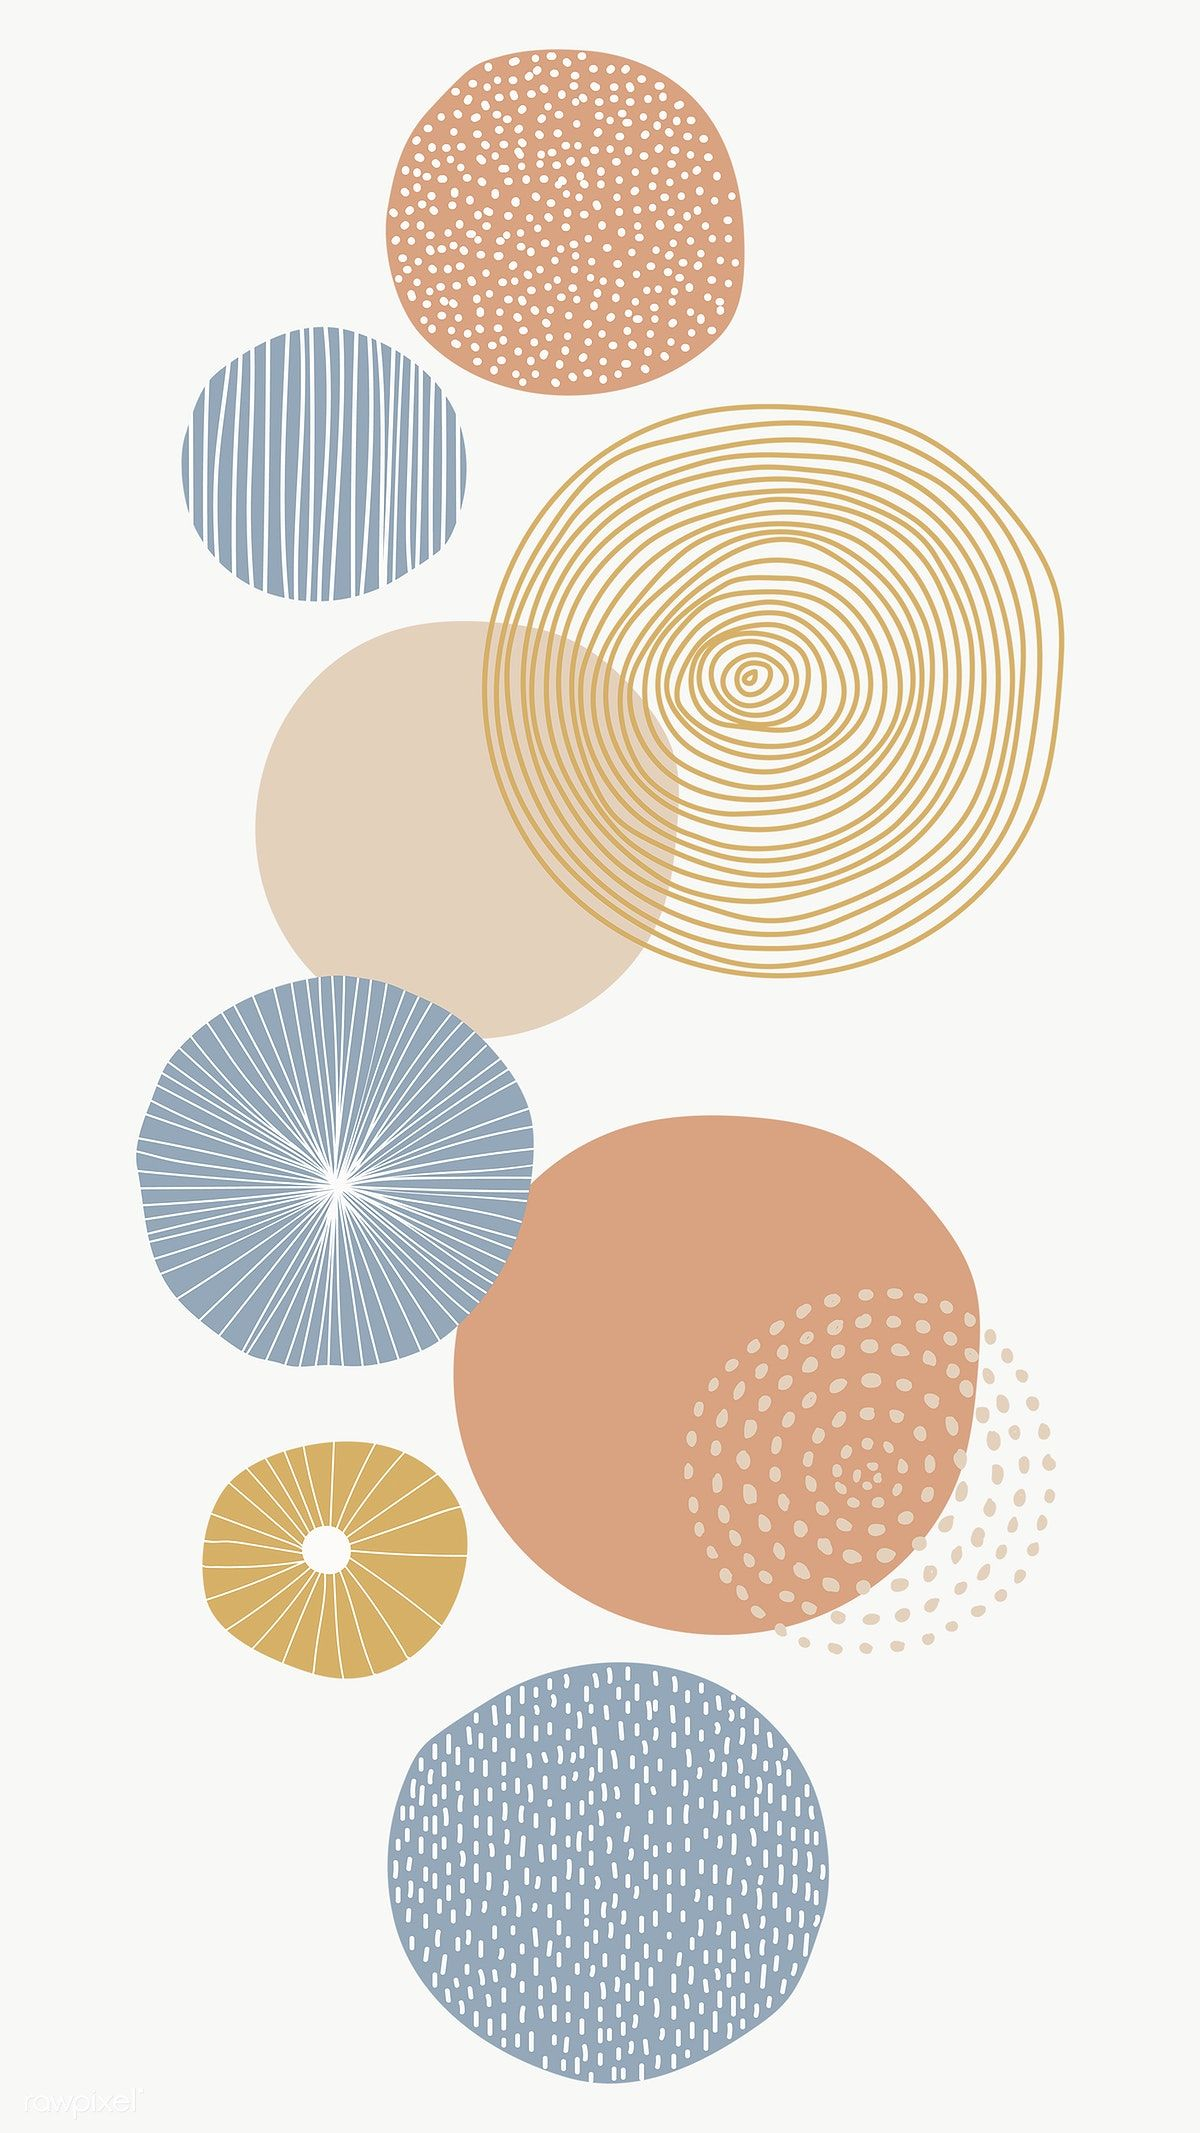 Round Patterned Background Transparent Png Premium Image By Rawpixel Com Nunny Geometric Art Prints Cute Patterns Wallpaper Geometric Art